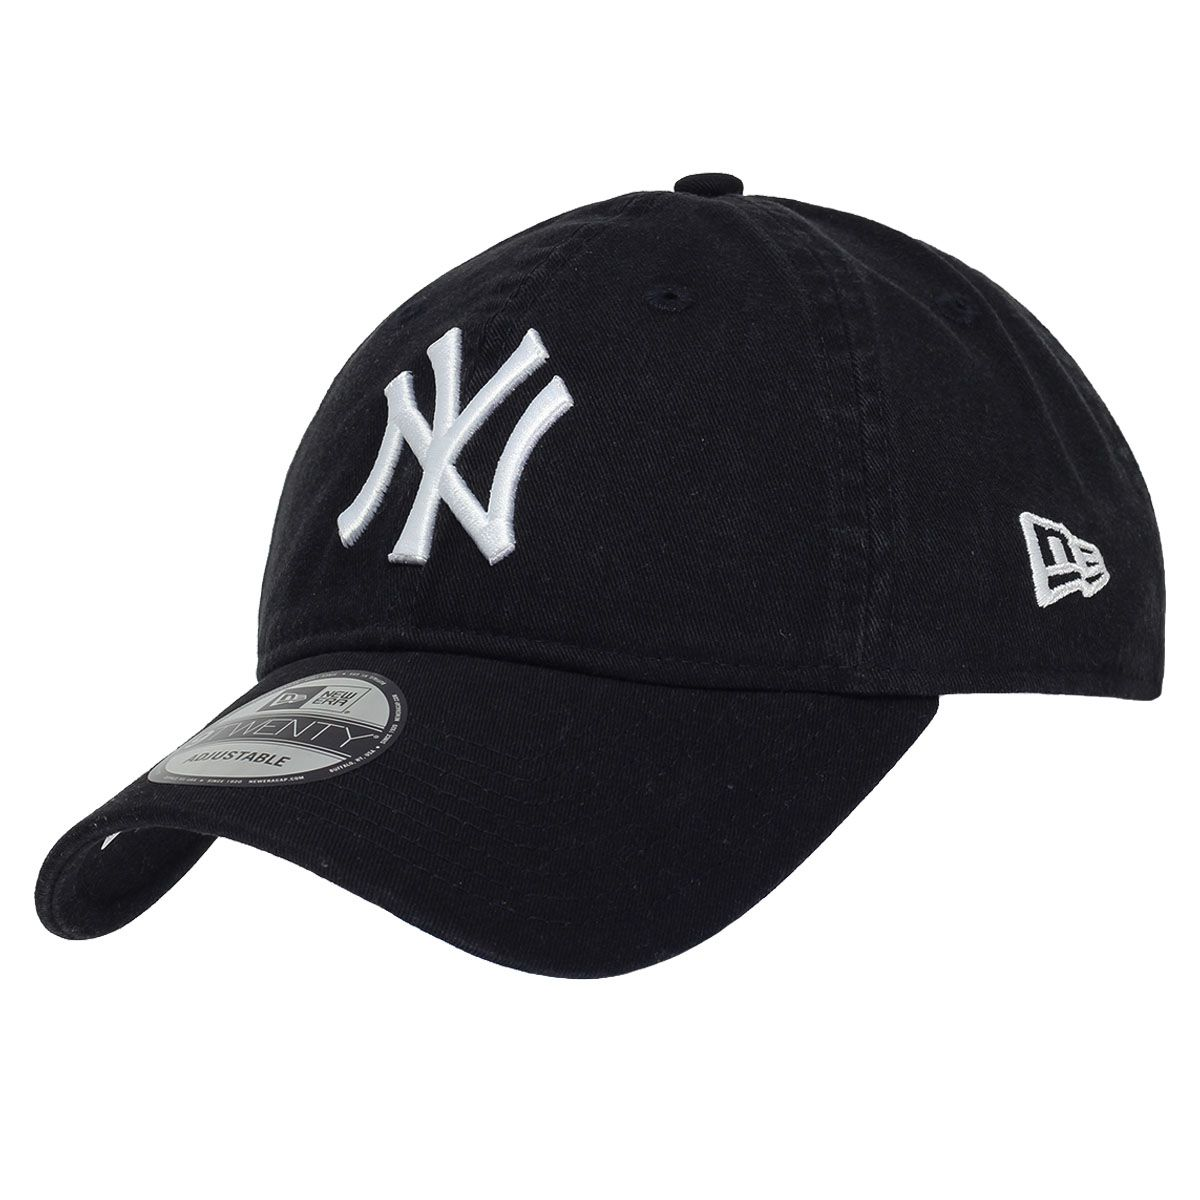 Boné New Era Aba Curva 920 ST MLB NY Yankees Candy Colors Preto